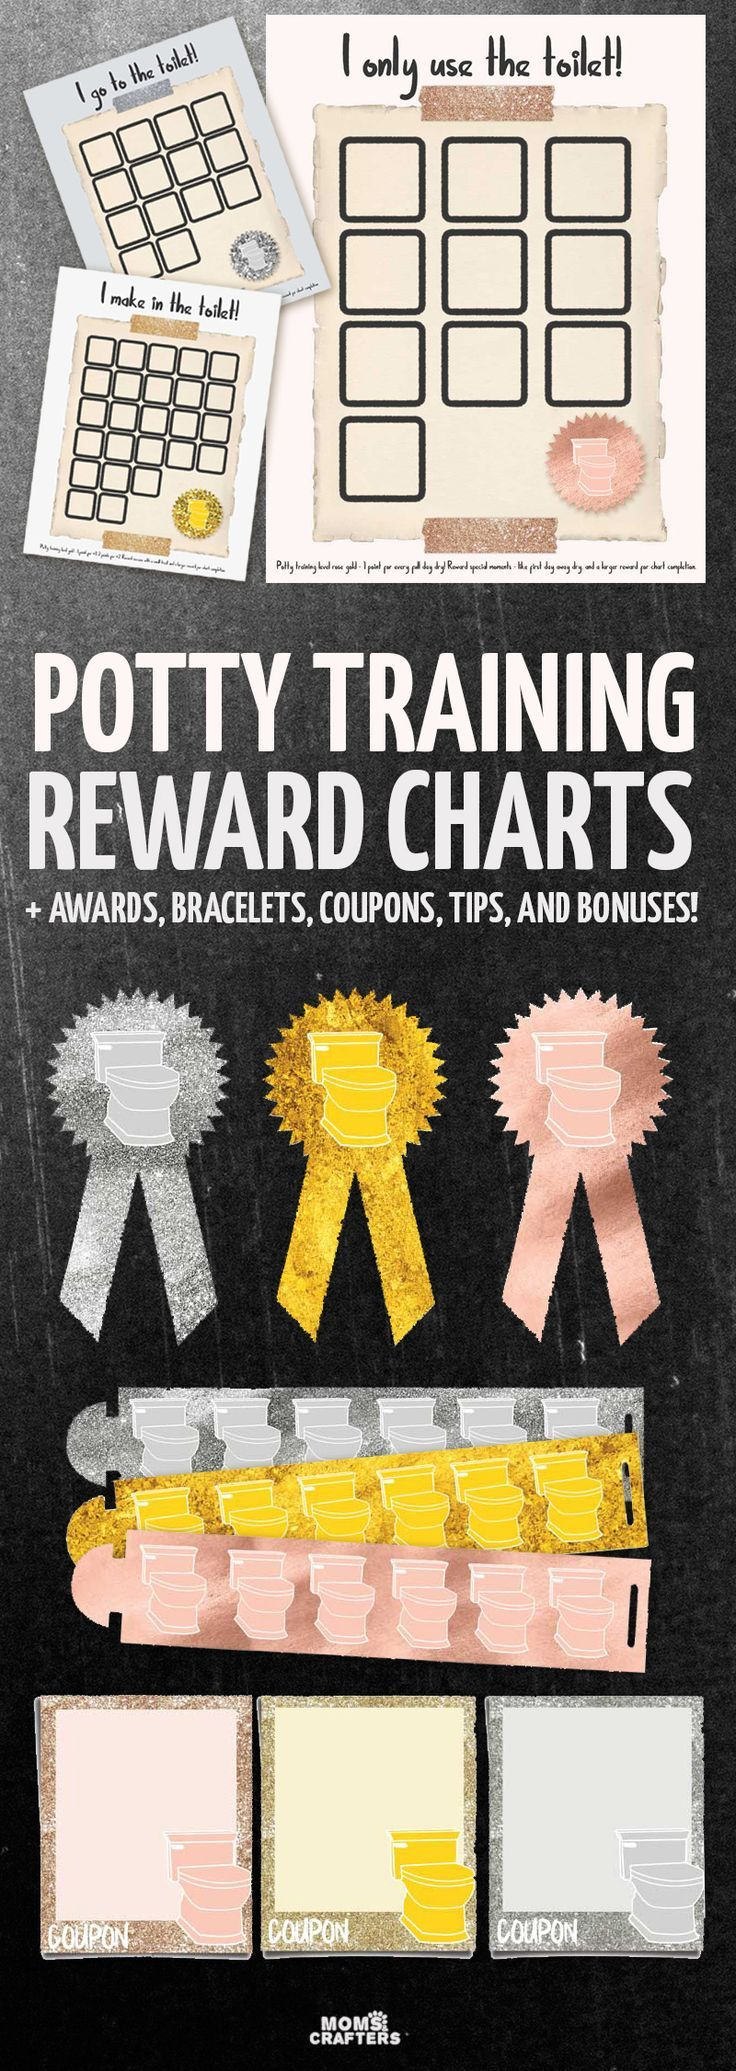 best ideas about potty training rewards potty 17 best ideas about potty training rewards potty training charts potty training sticker chart and potty training boys